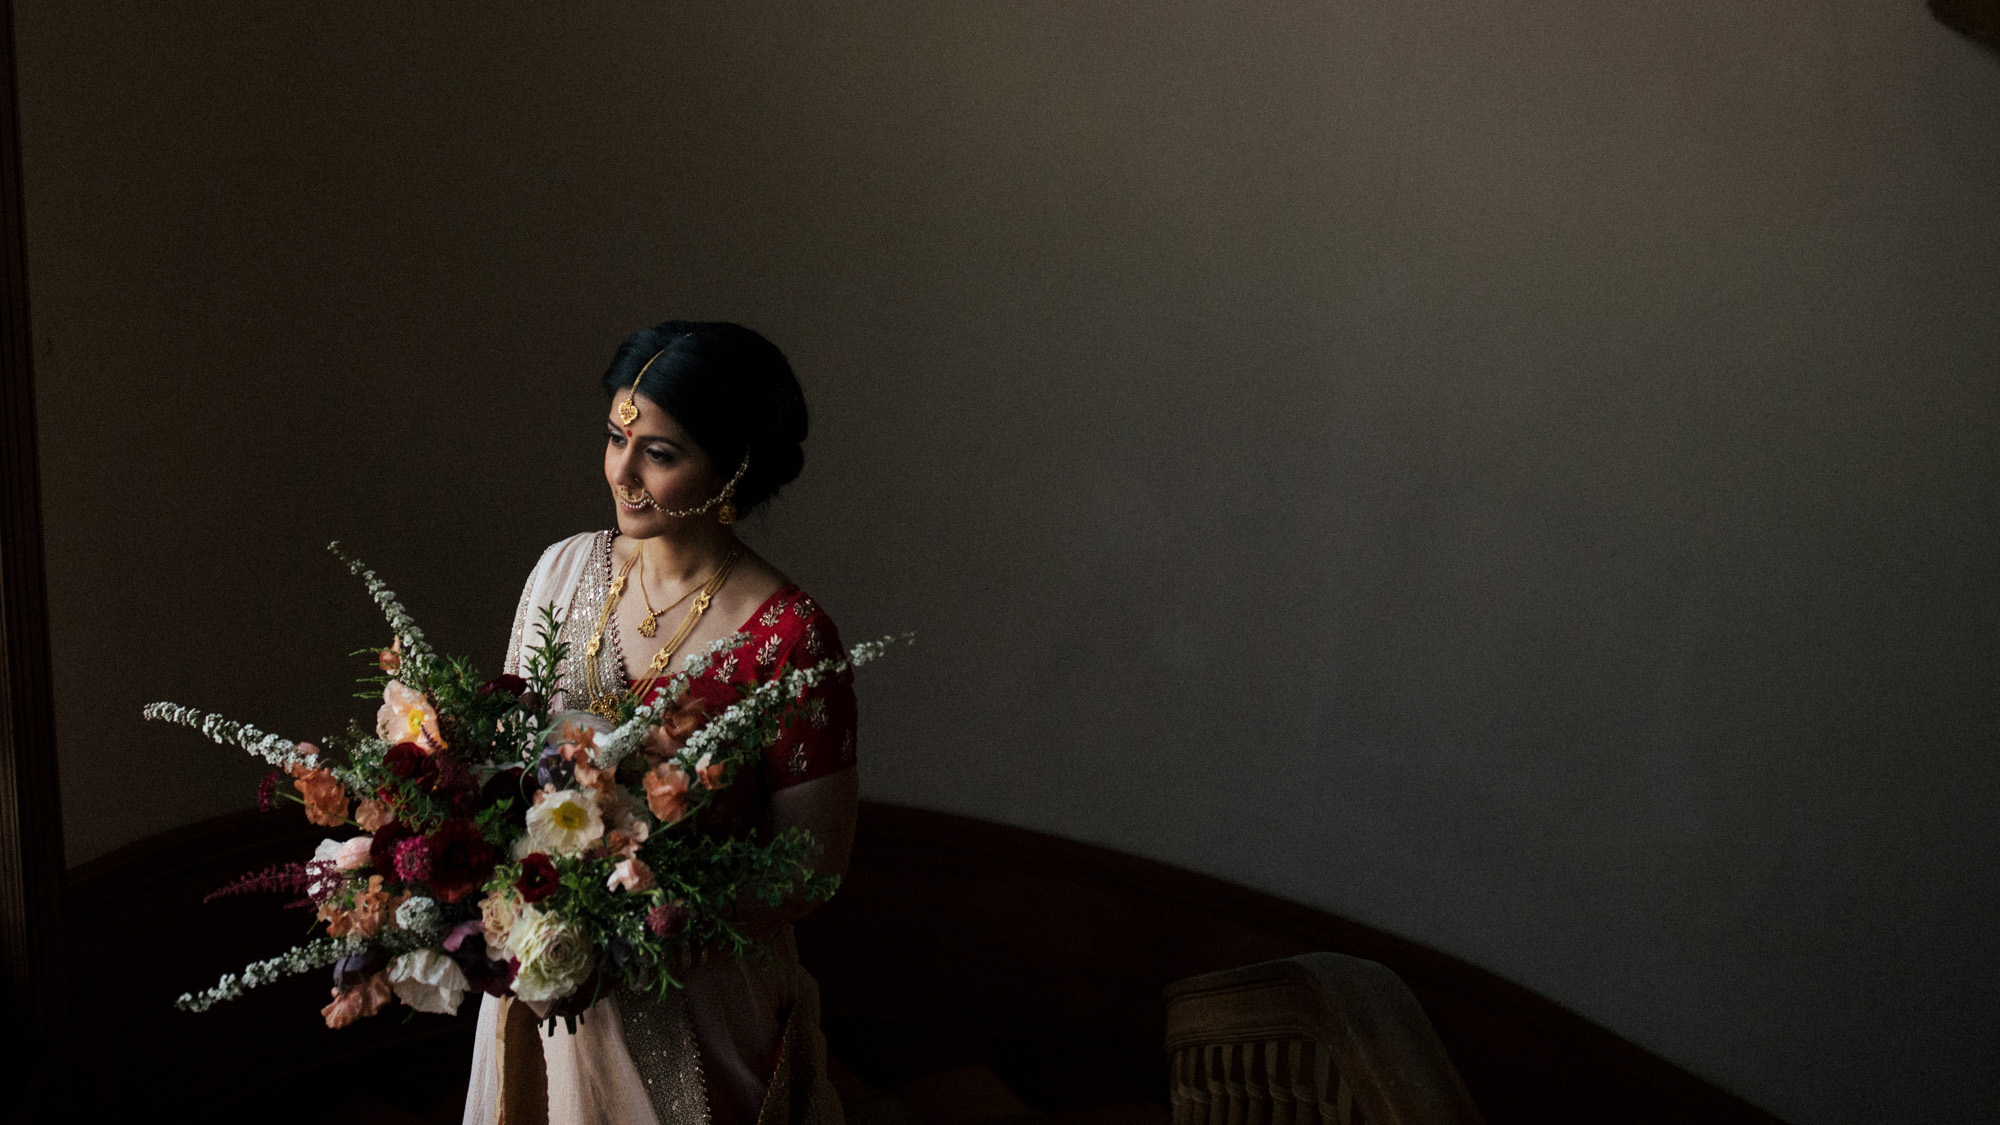 anu_maneesh_alec_vanderboom_Indian_wedding_photography-0057.jpg